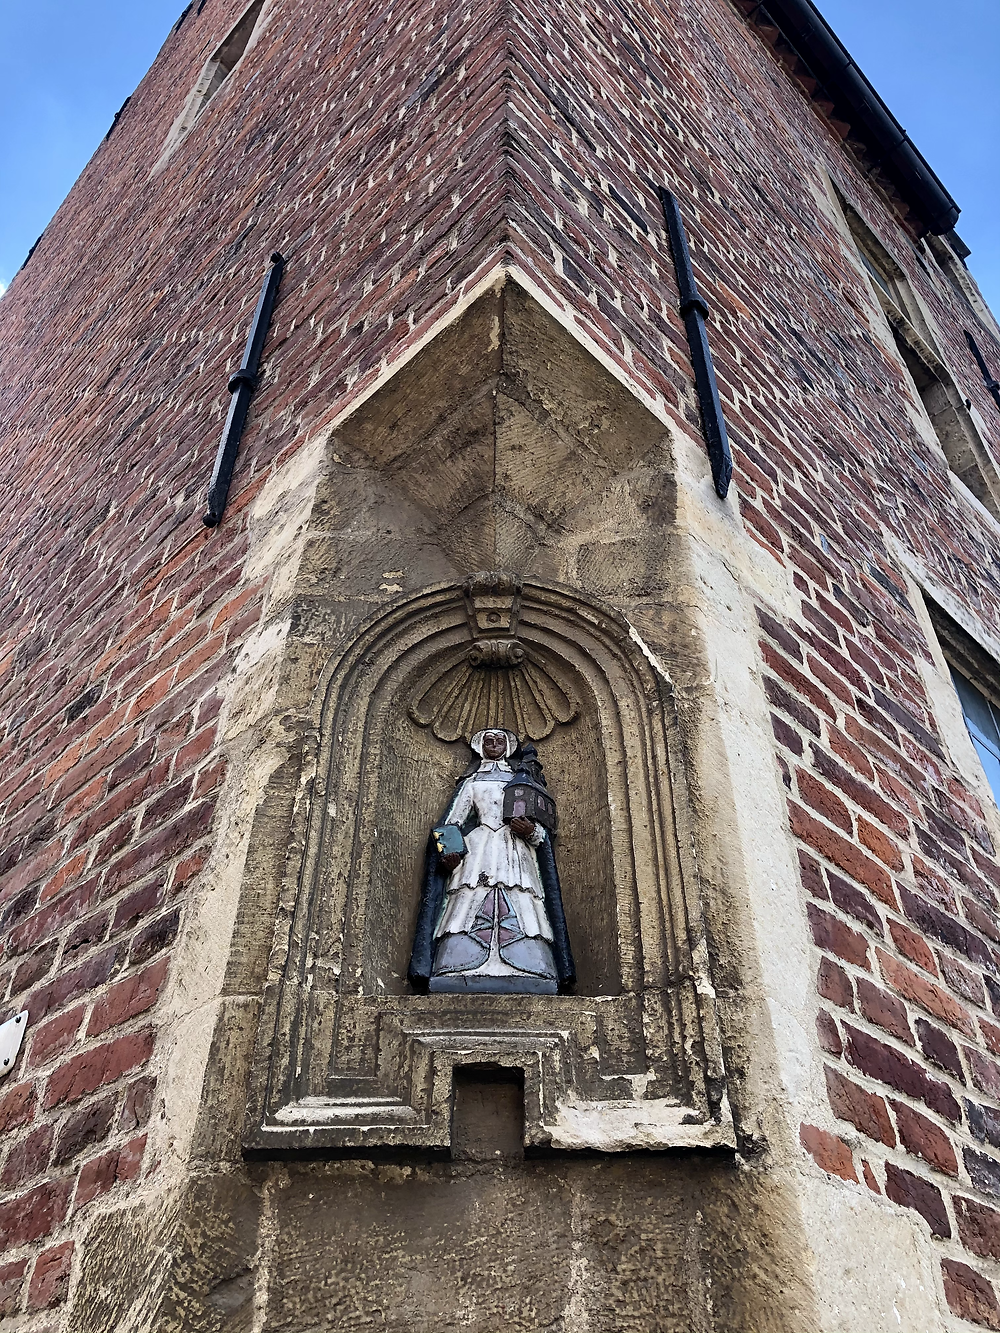 Statue of beguine in Leuven